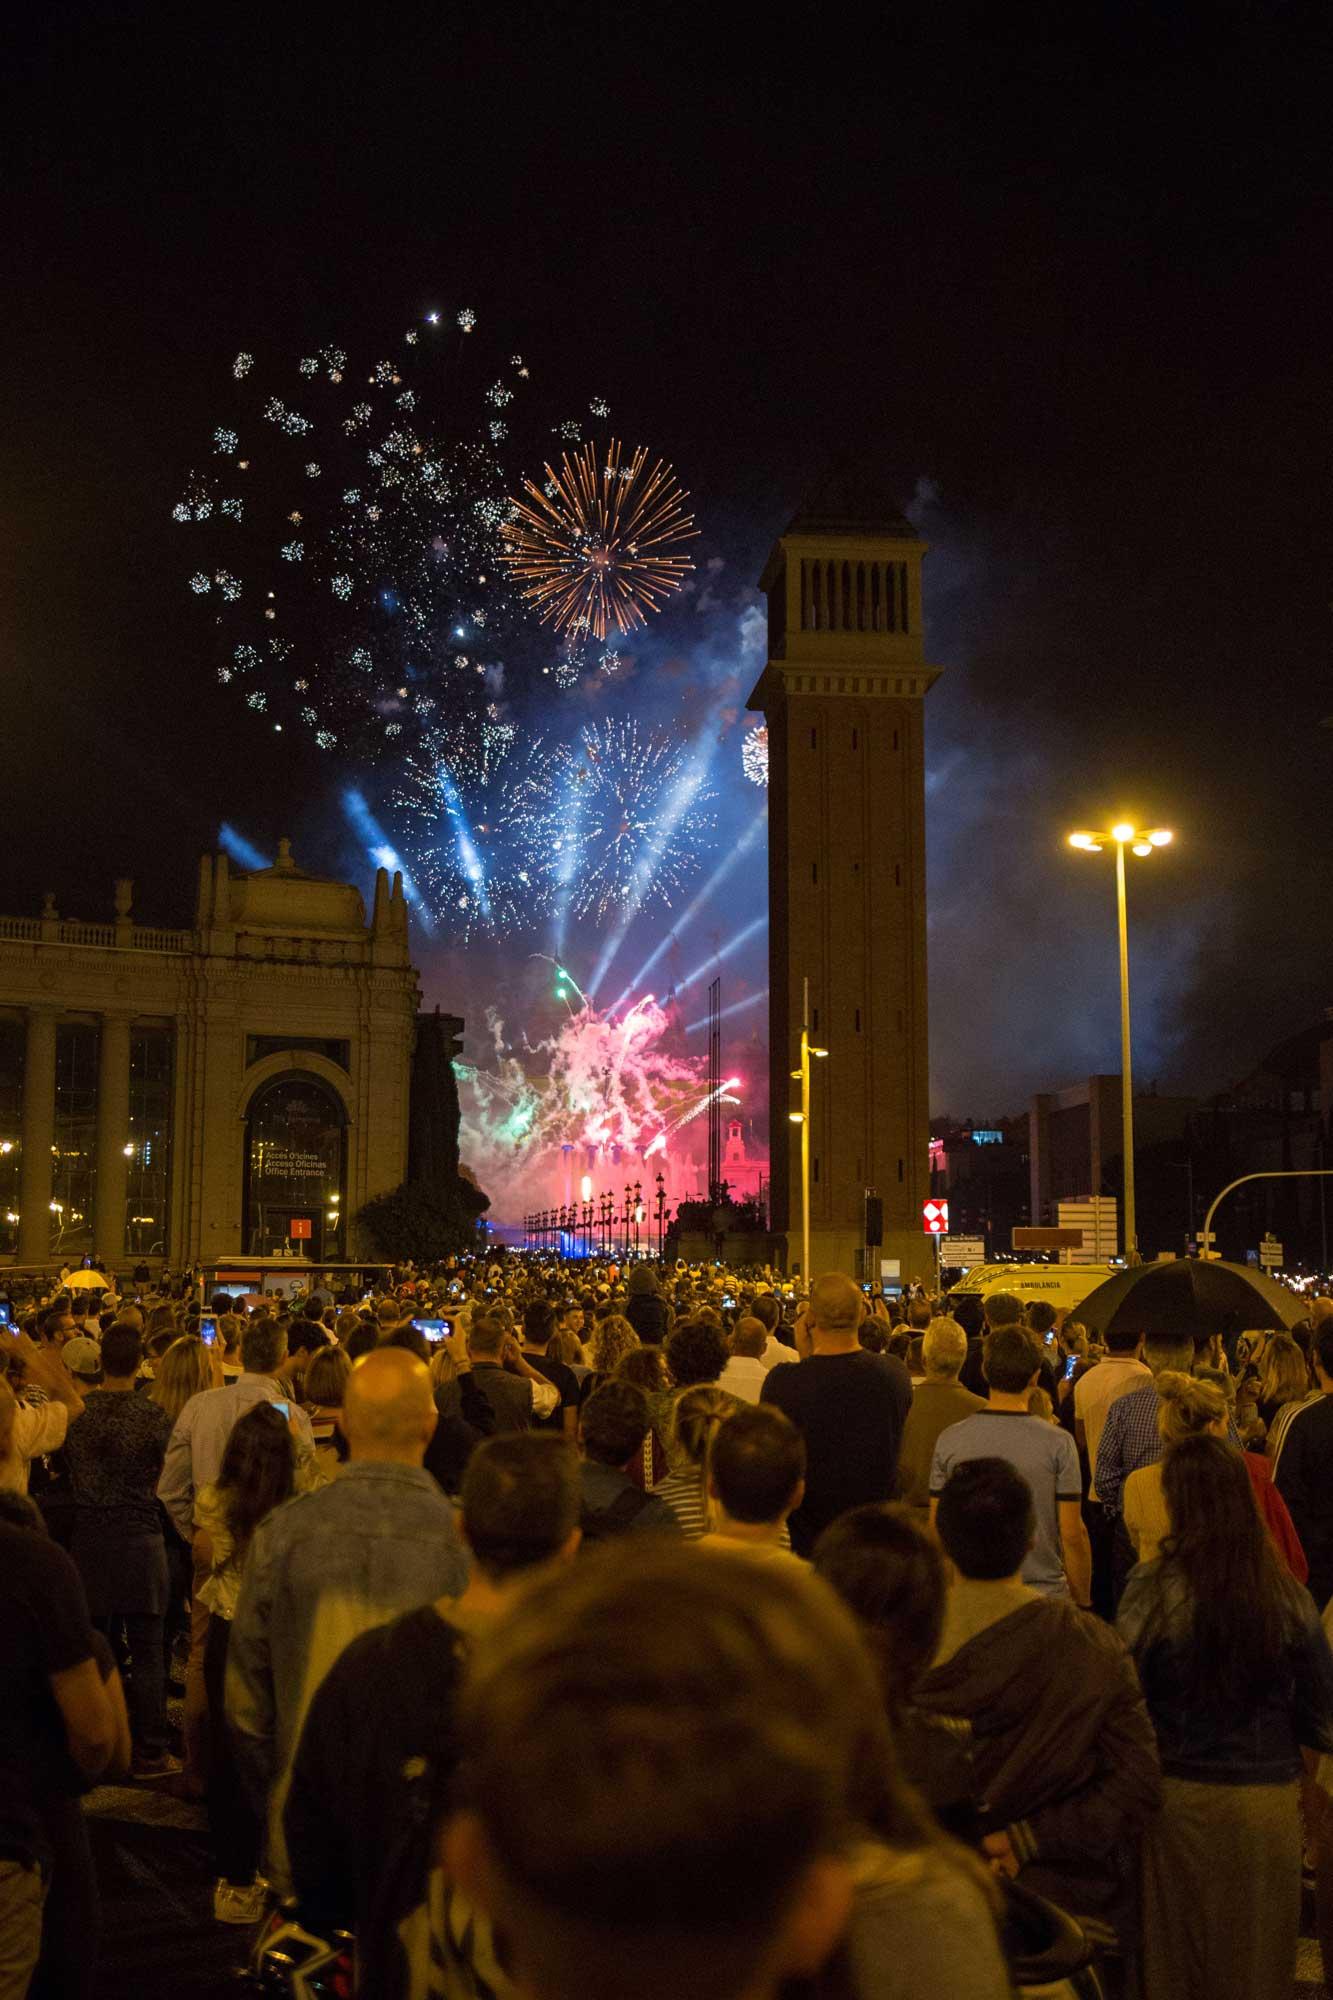 2016 — Fireworks at the Plaça Espanya during the Festival La Mercè